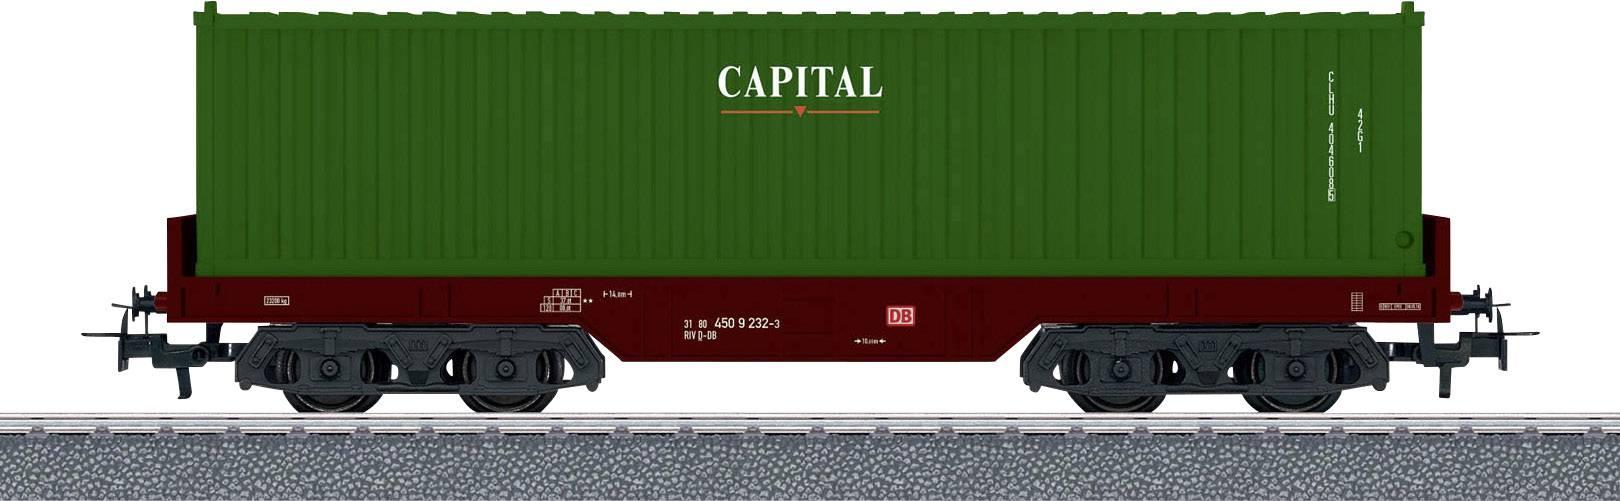 lighting installation Märklin//Trix Grinder Set H0 for 2 Axle Pers freight wagons